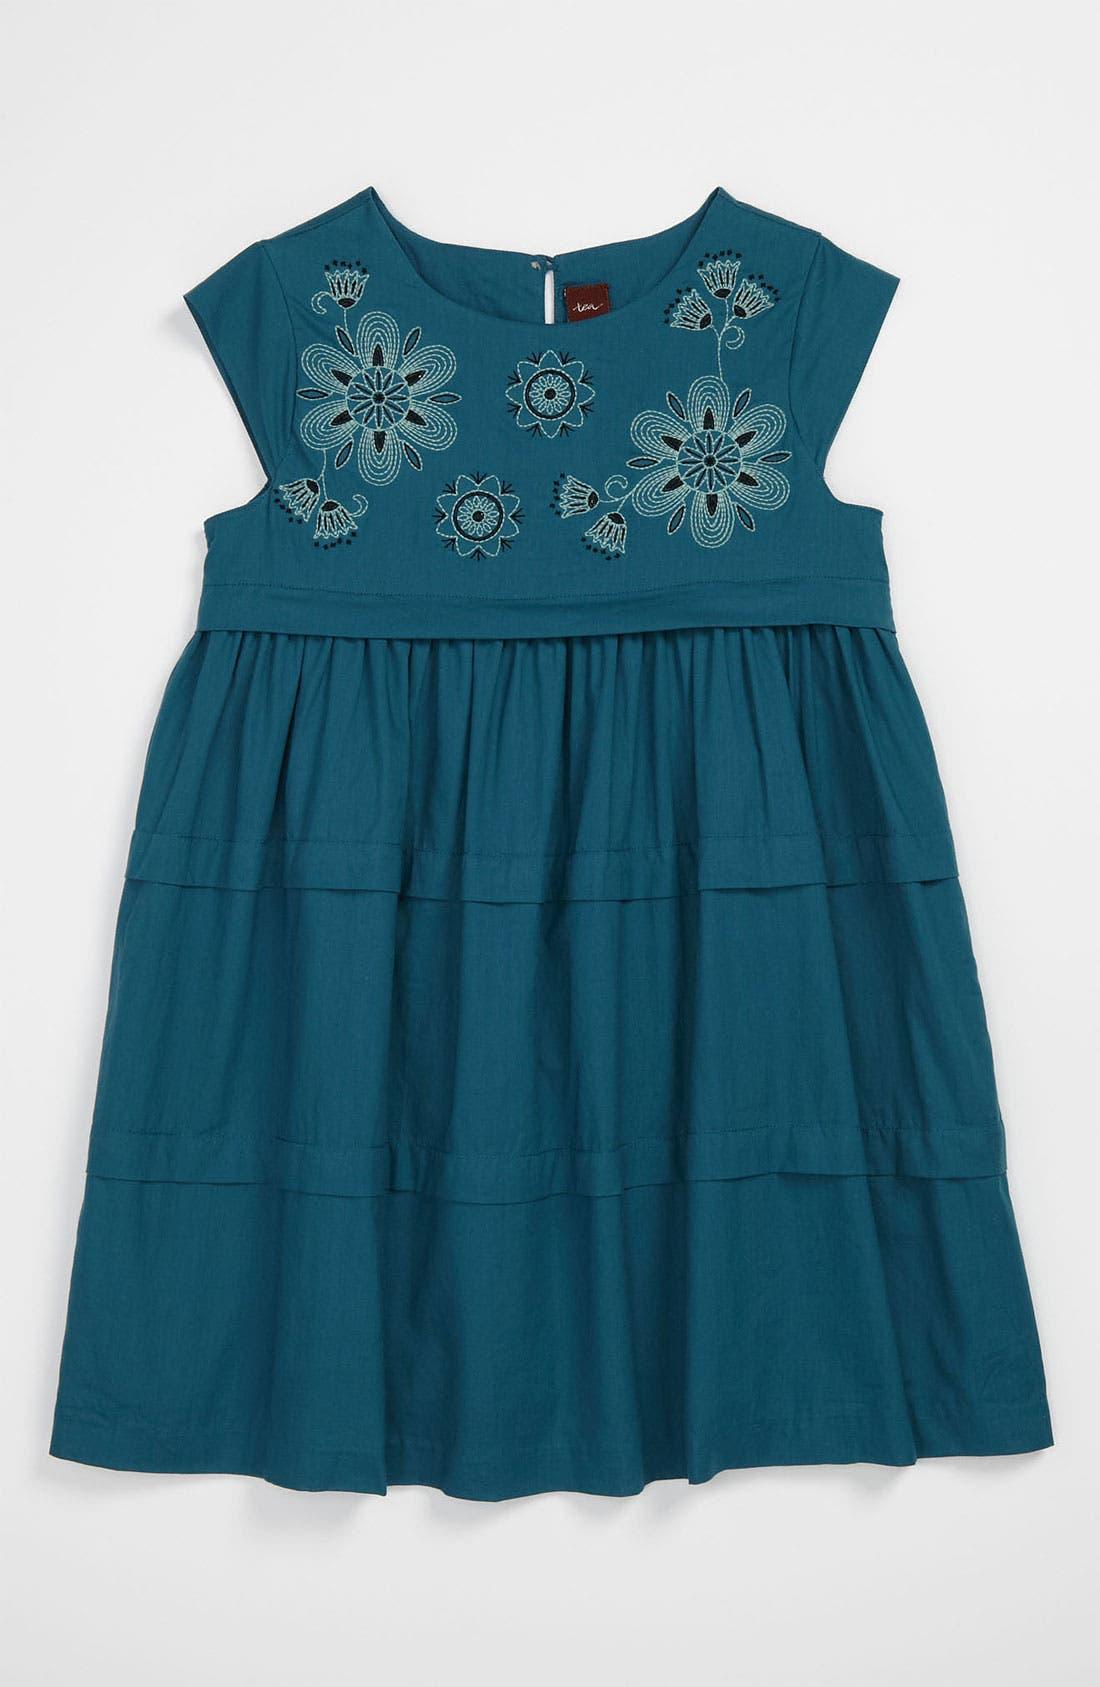 Main Image - Tea Collection Needlepoint Floral Dress (Little Girls & Big Girls)